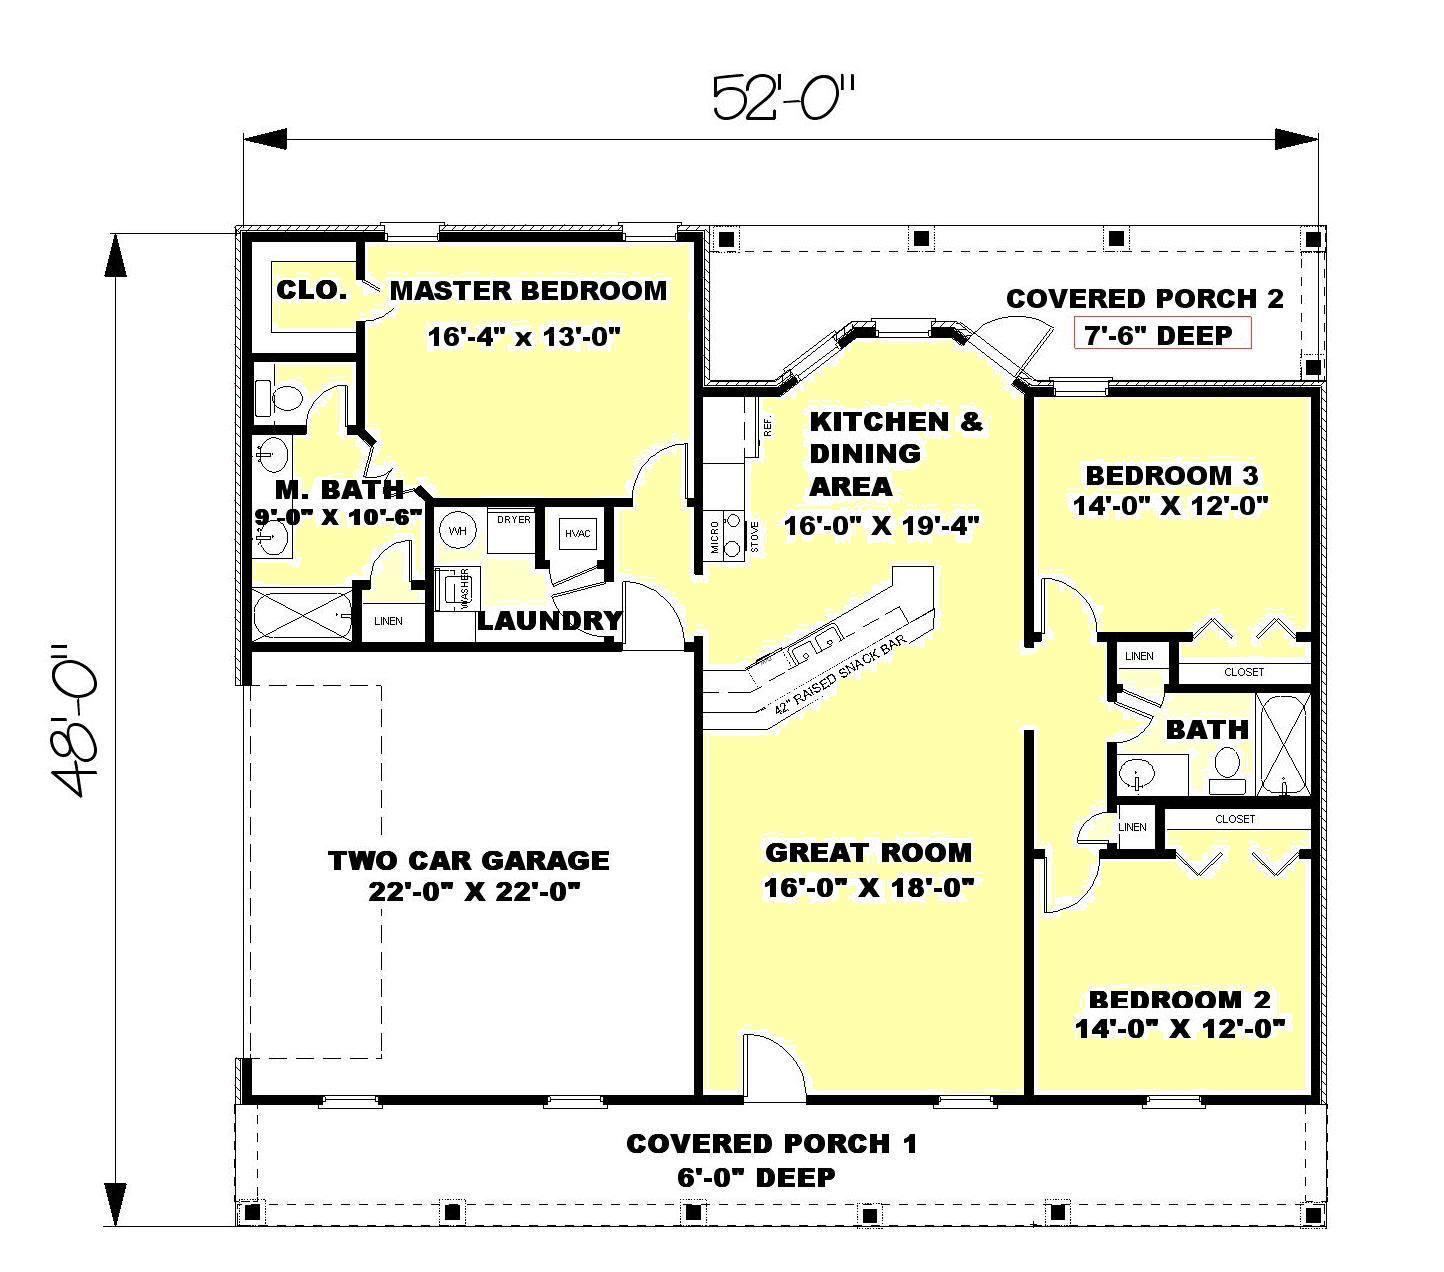 ranch style house plan 3 beds 2 baths 1500 sqft plan 44